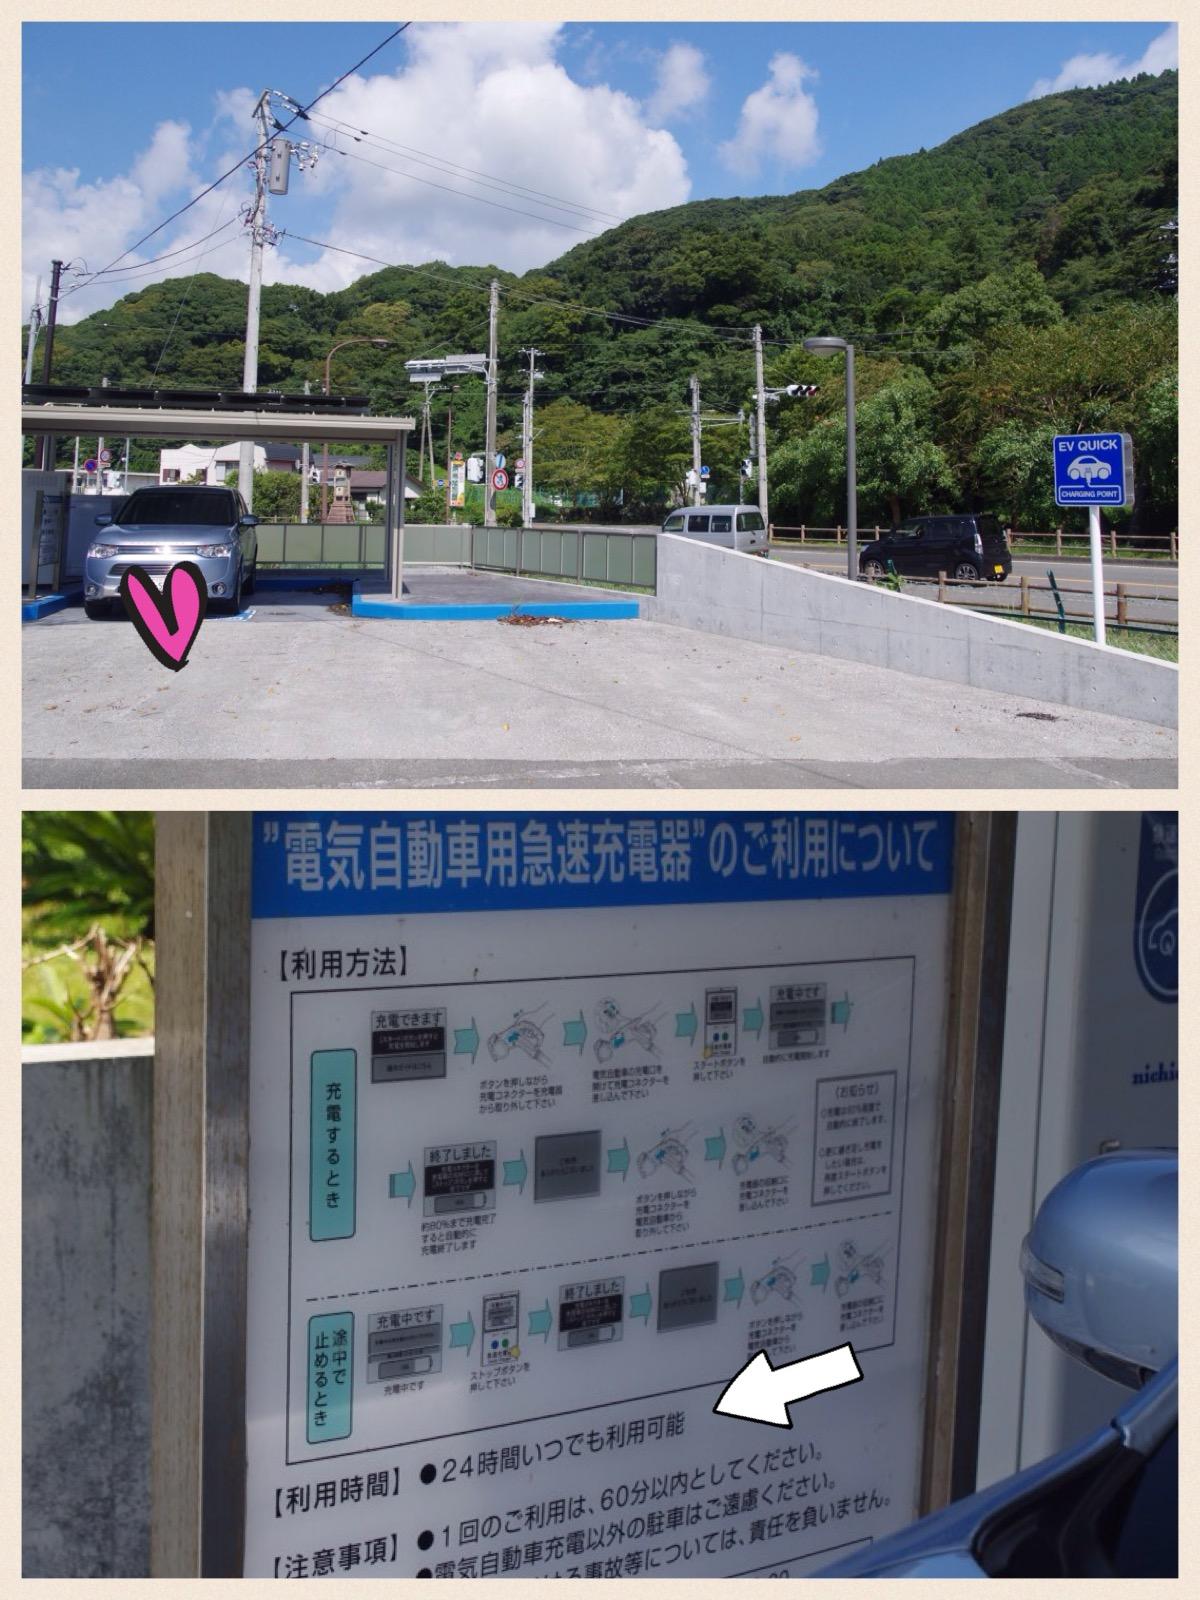 EV充電スポット道の駅 下加茂温泉 湯の花